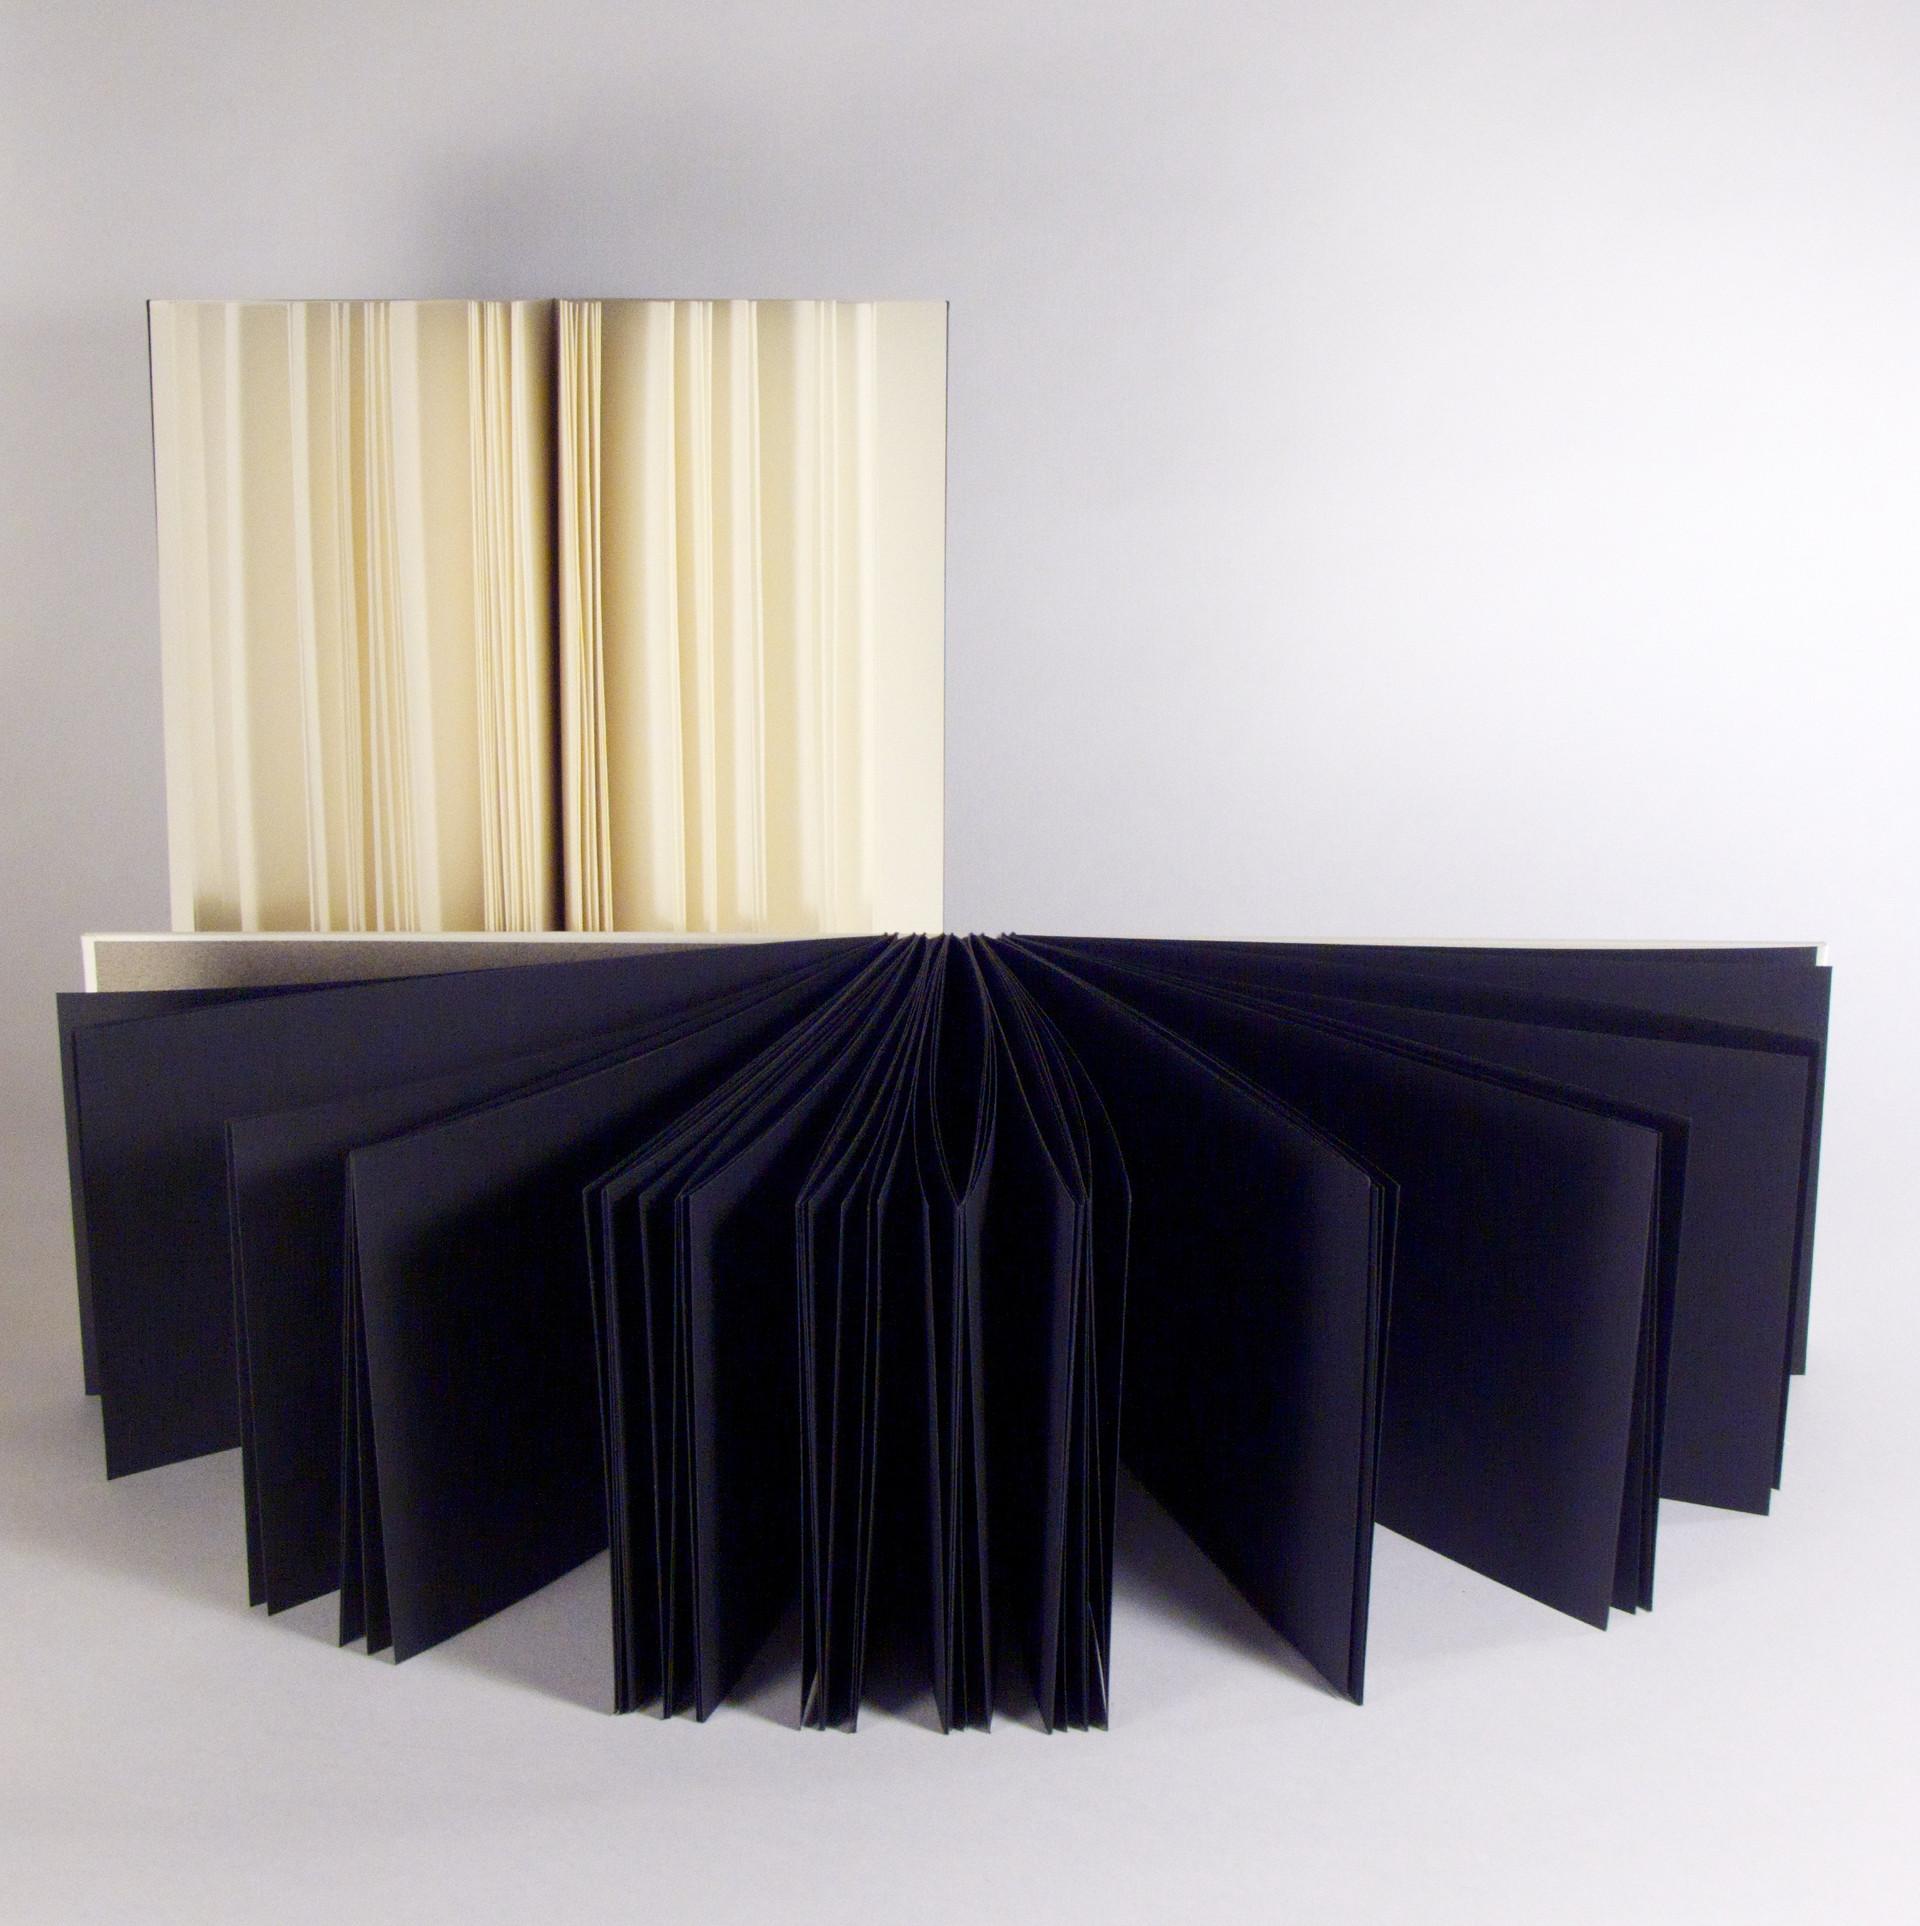 Duotone #3 (2010) - Interior